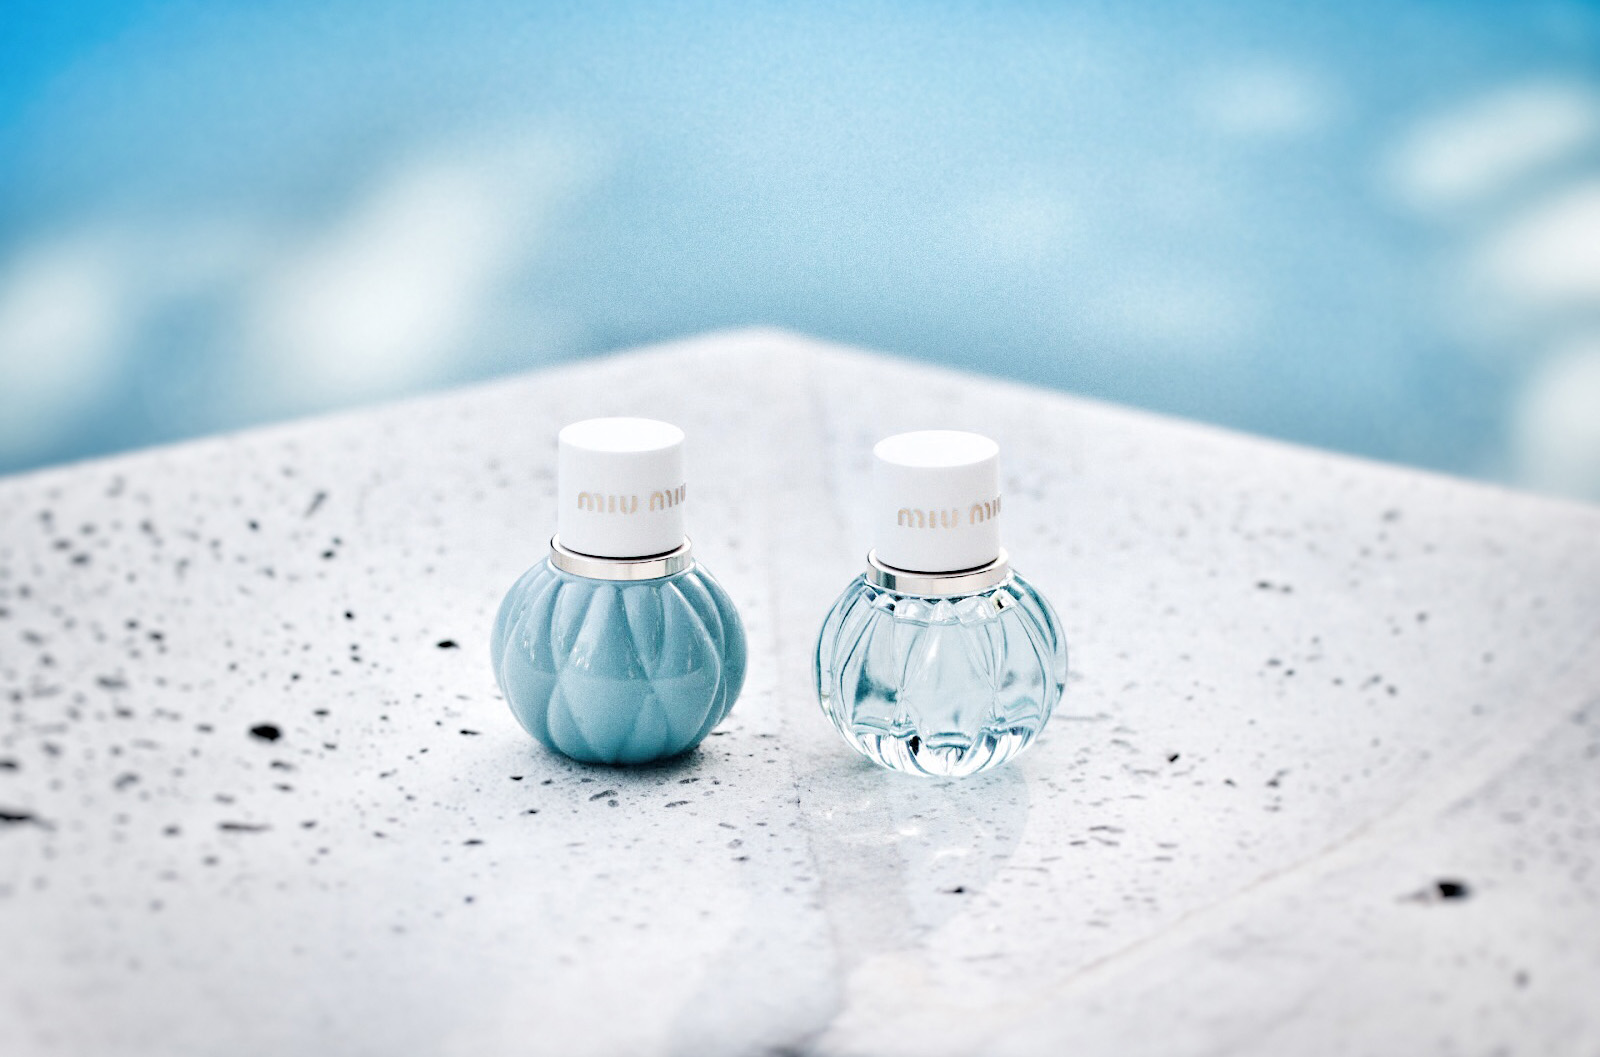 miu miu l'eau bleue premier parfum miniatures avis test